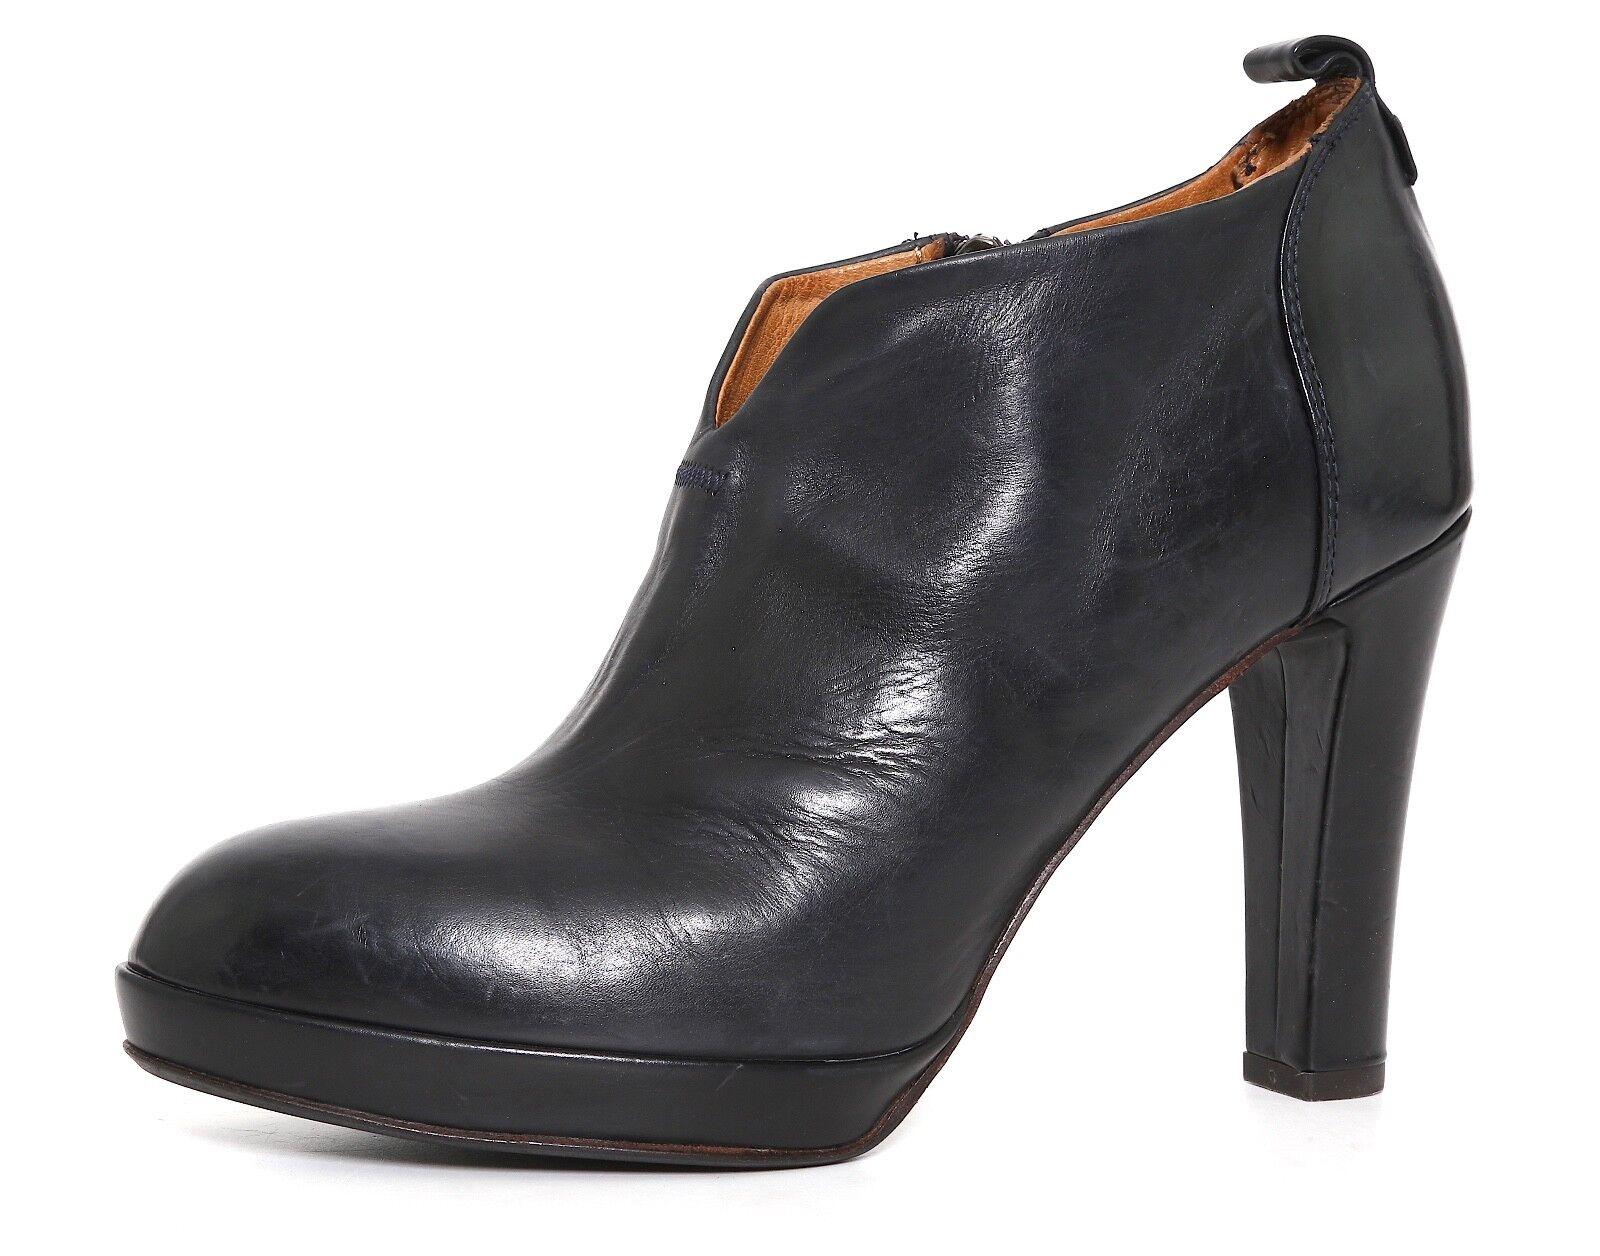 Alberto Fermani High Heel Leather Booties Black Women Sz 39 EUR 2815